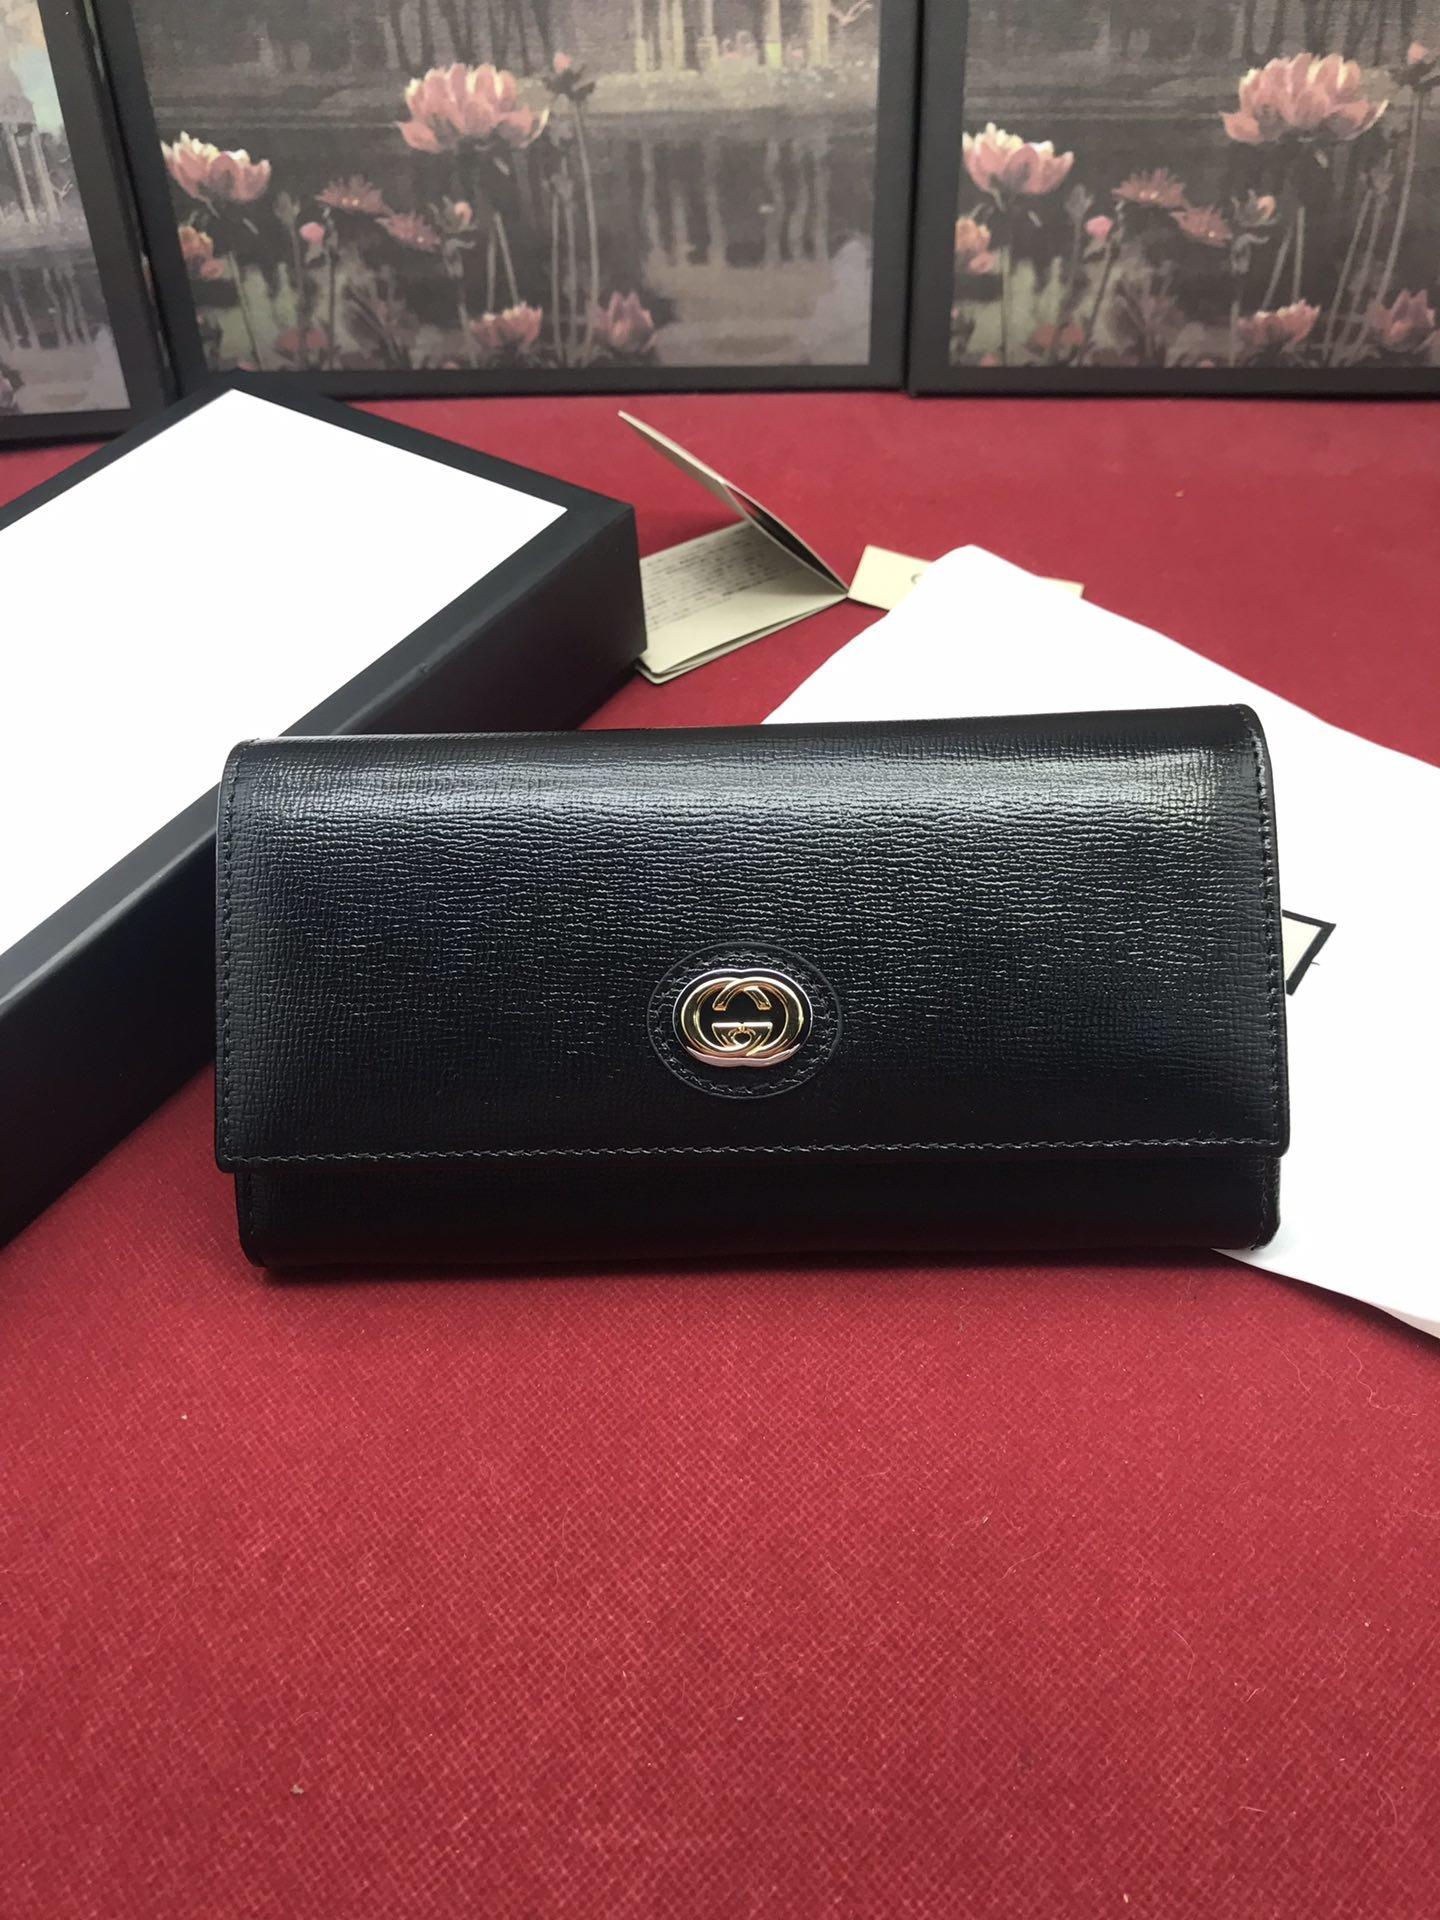 Replica Gucci 598531 Women Leather Continental Wallet Black